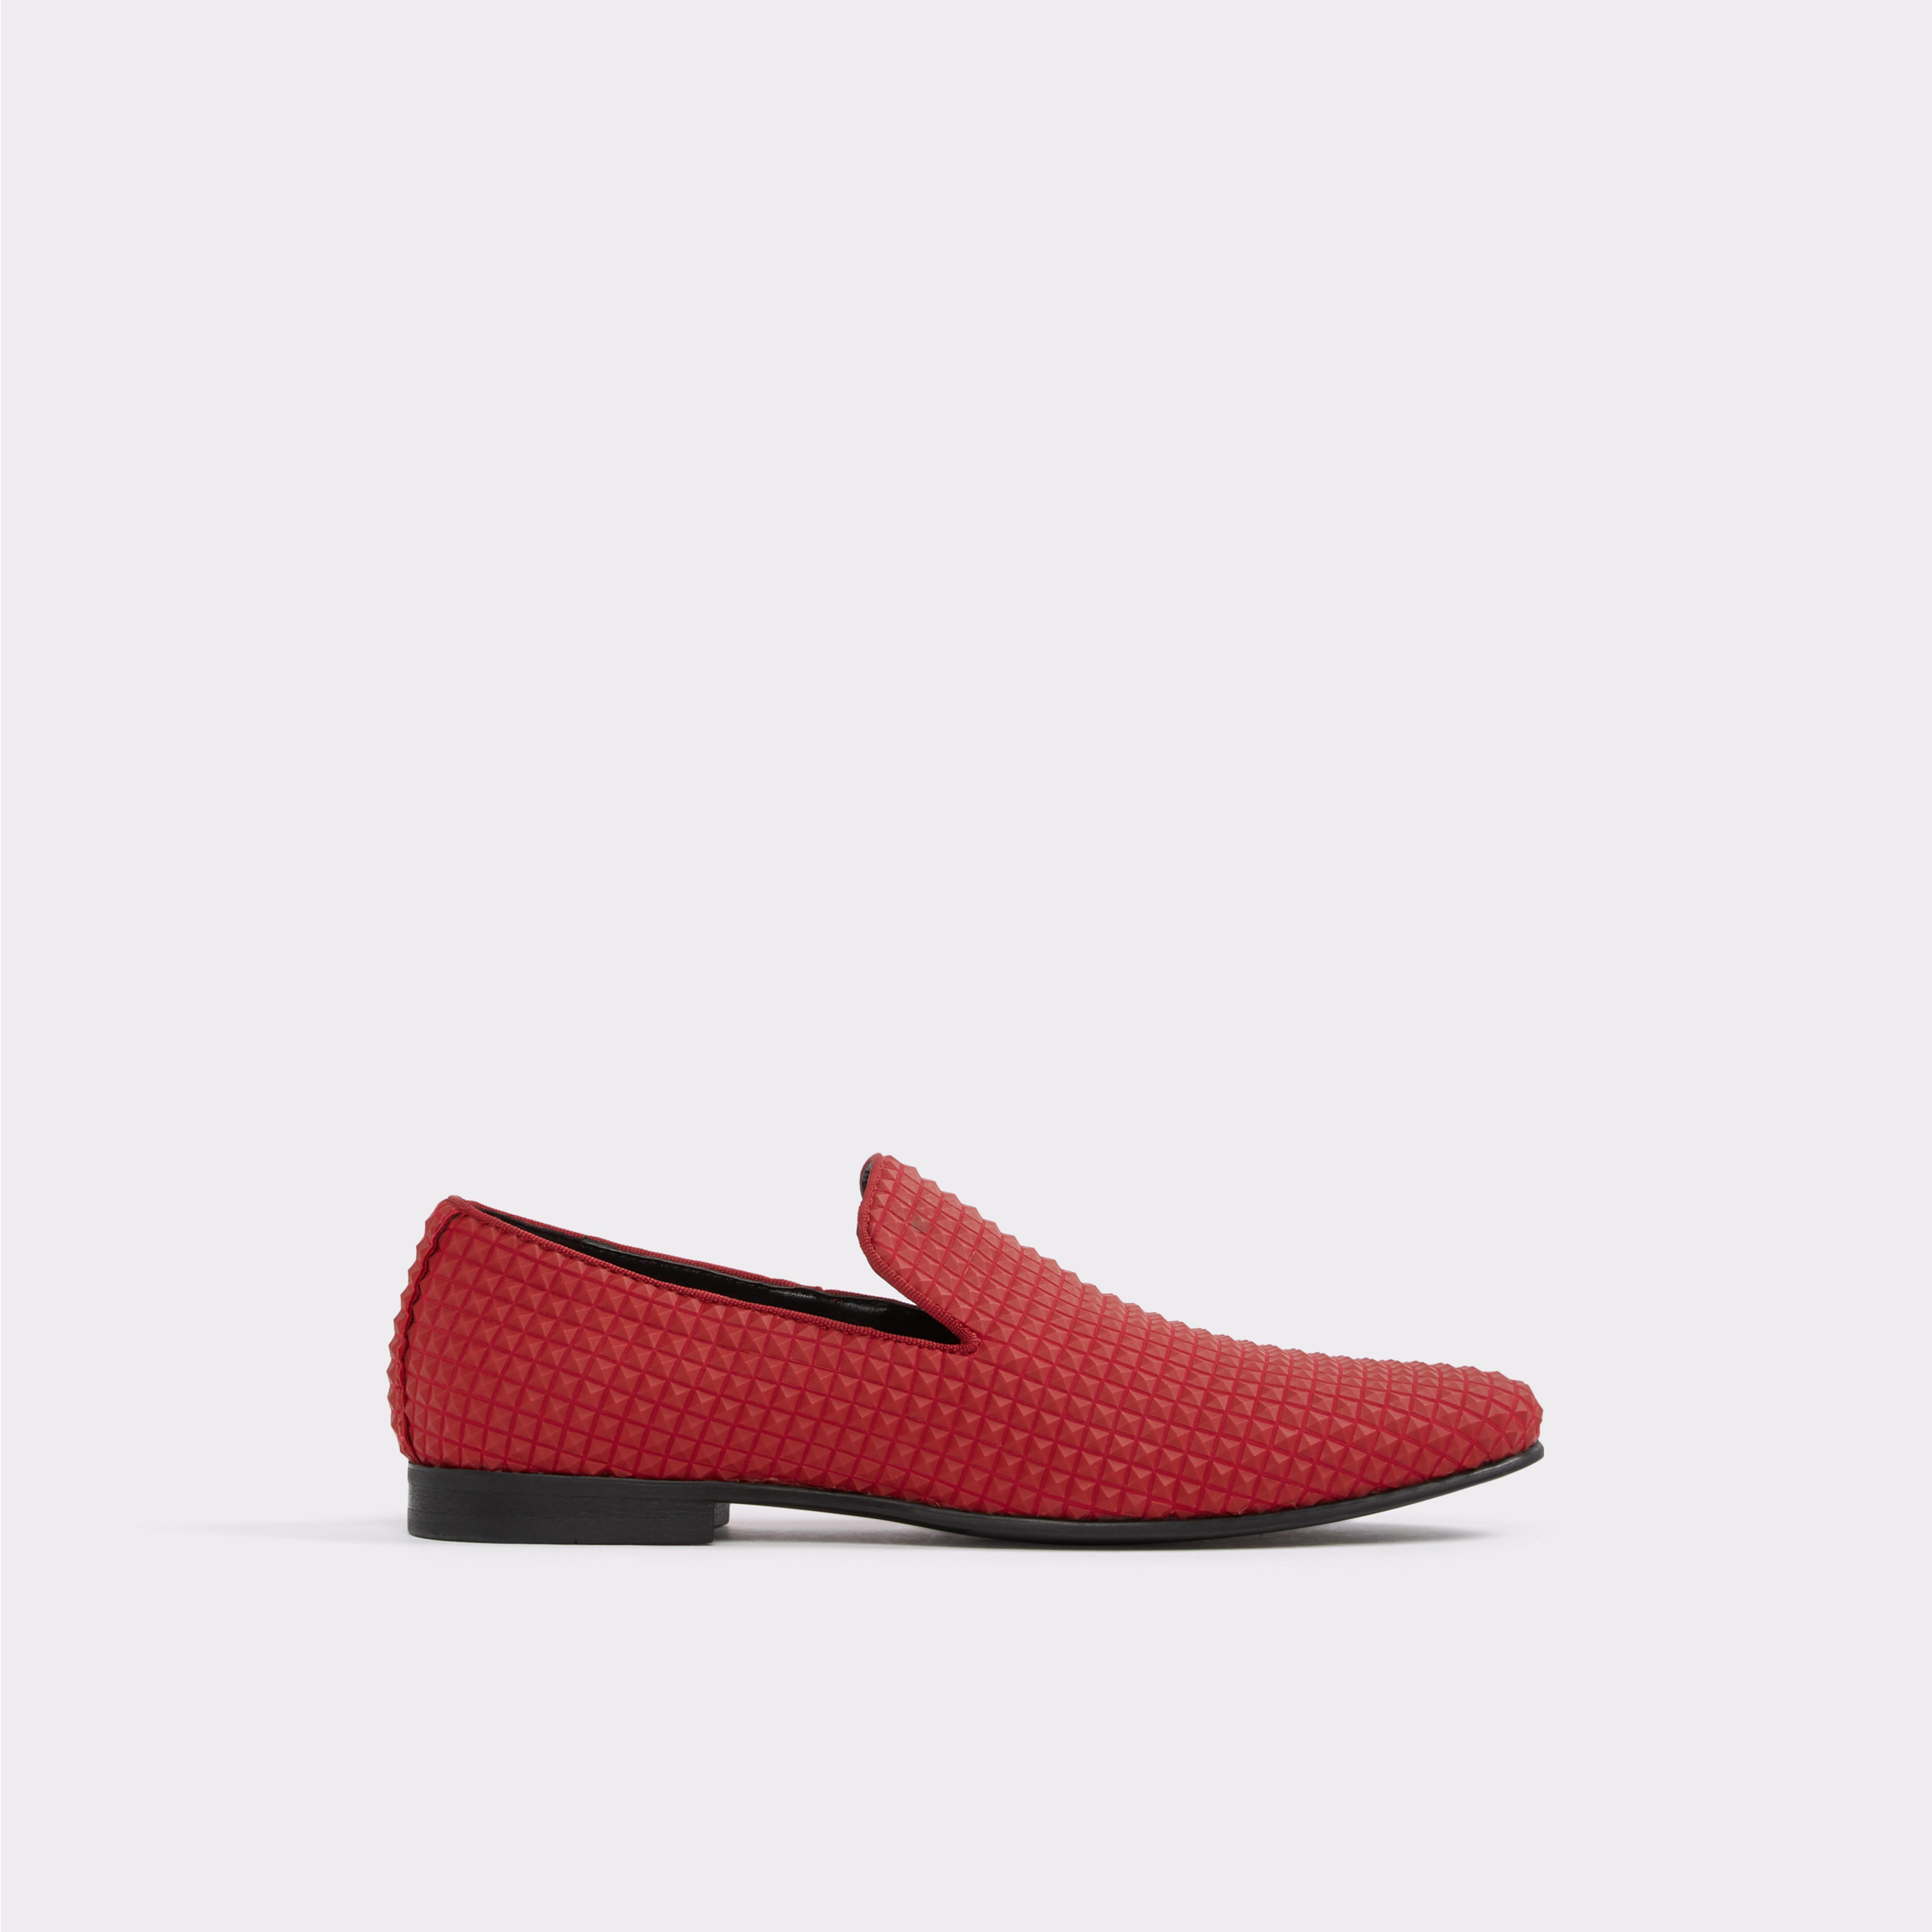 aldo shoes price adjustment anthropologie sale tops